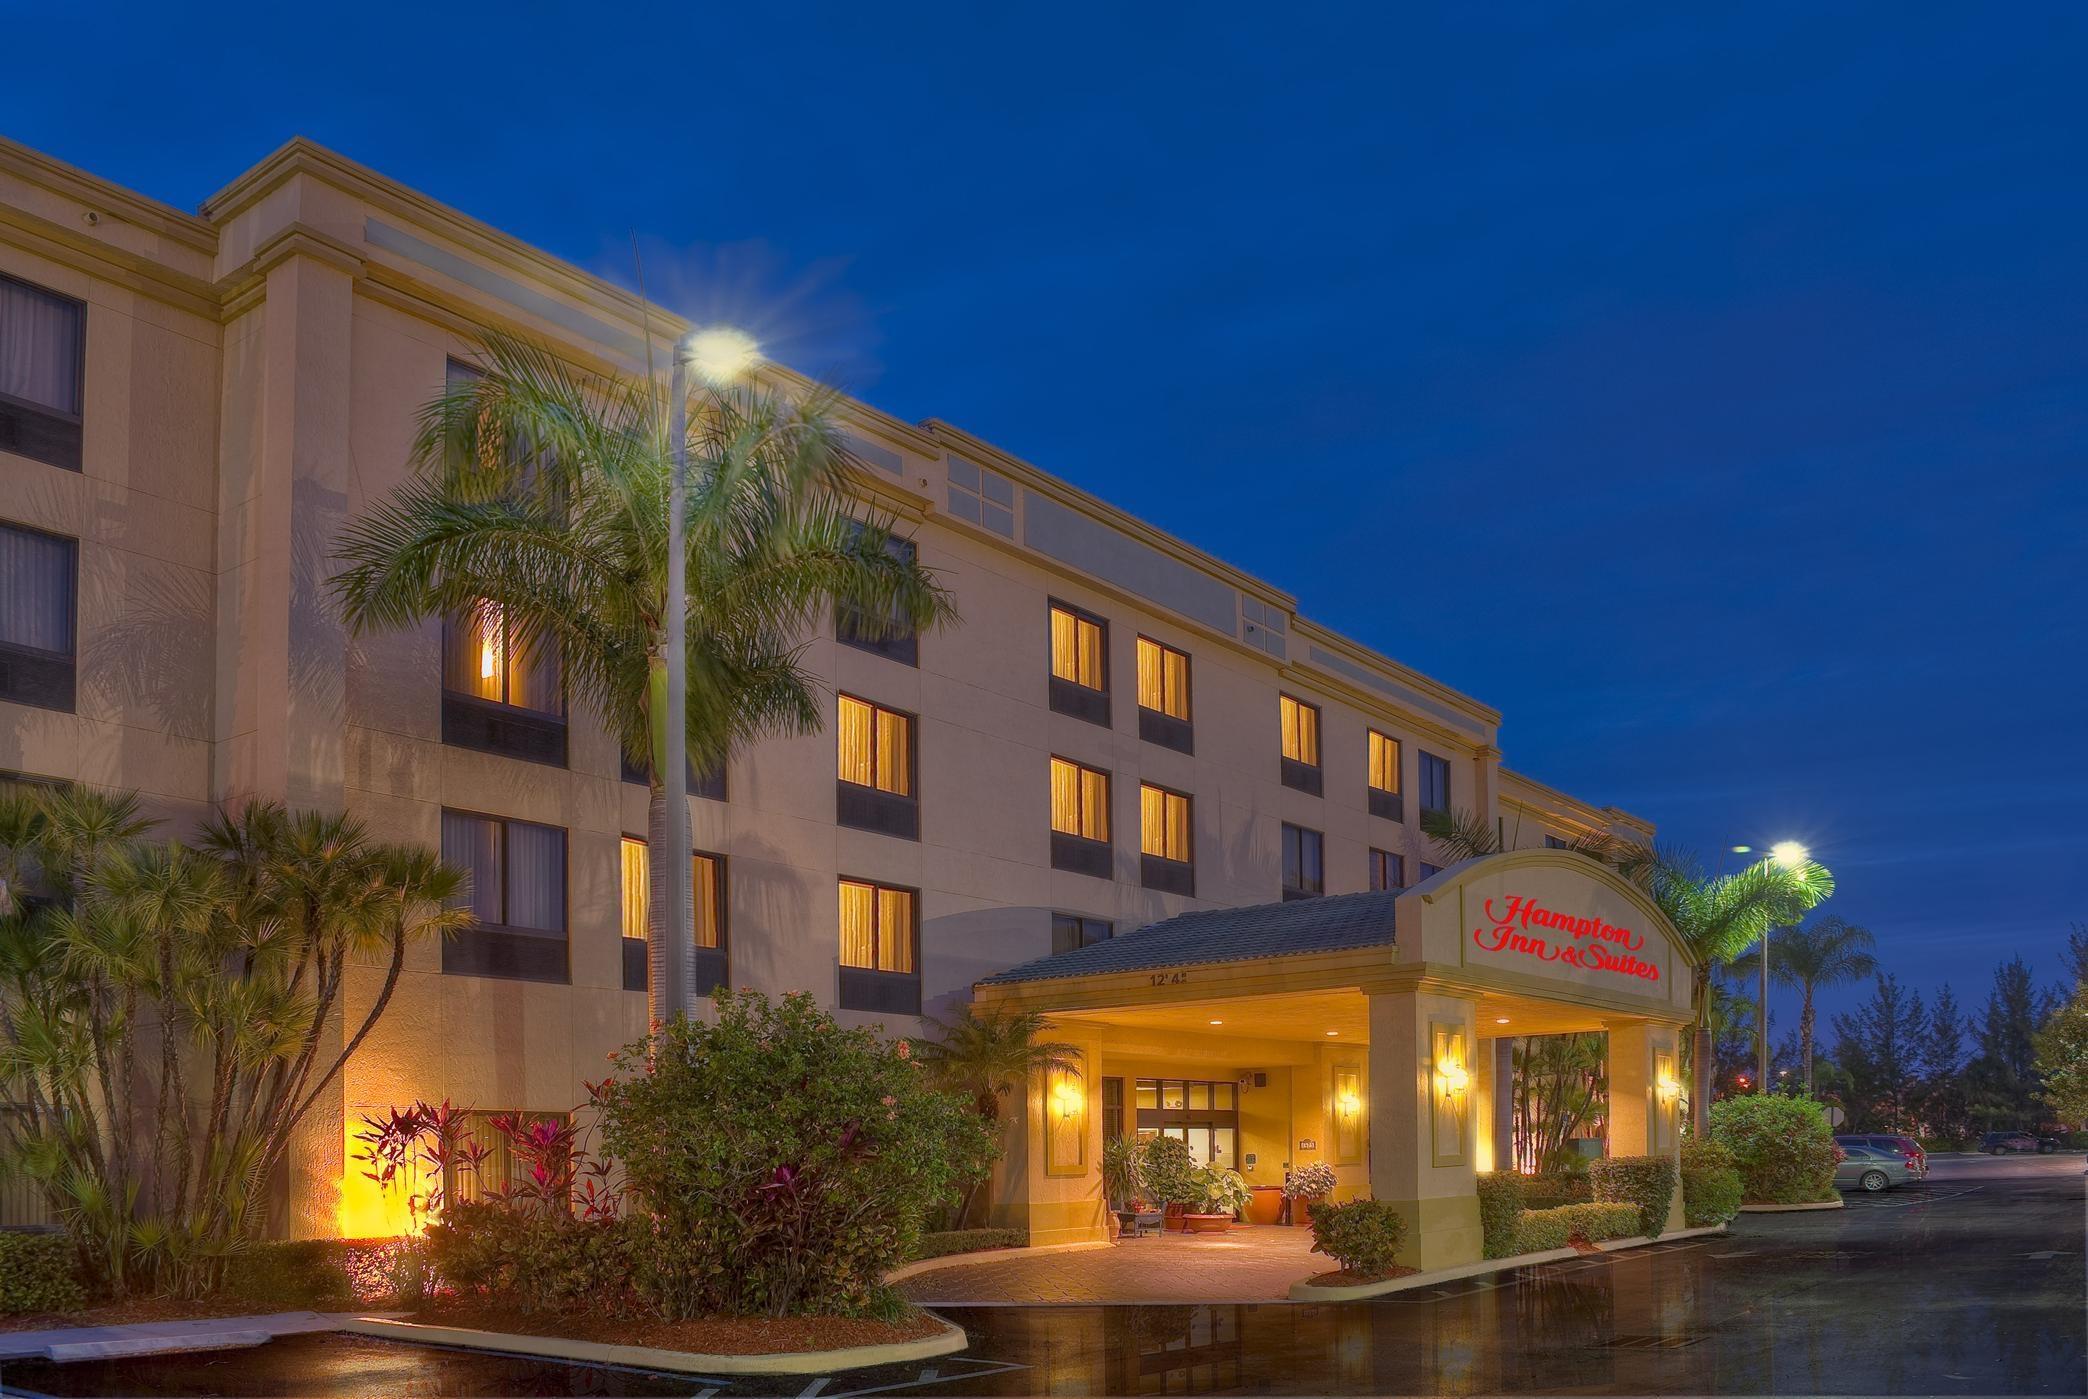 Boynton Beach Florida Hotels And Motels